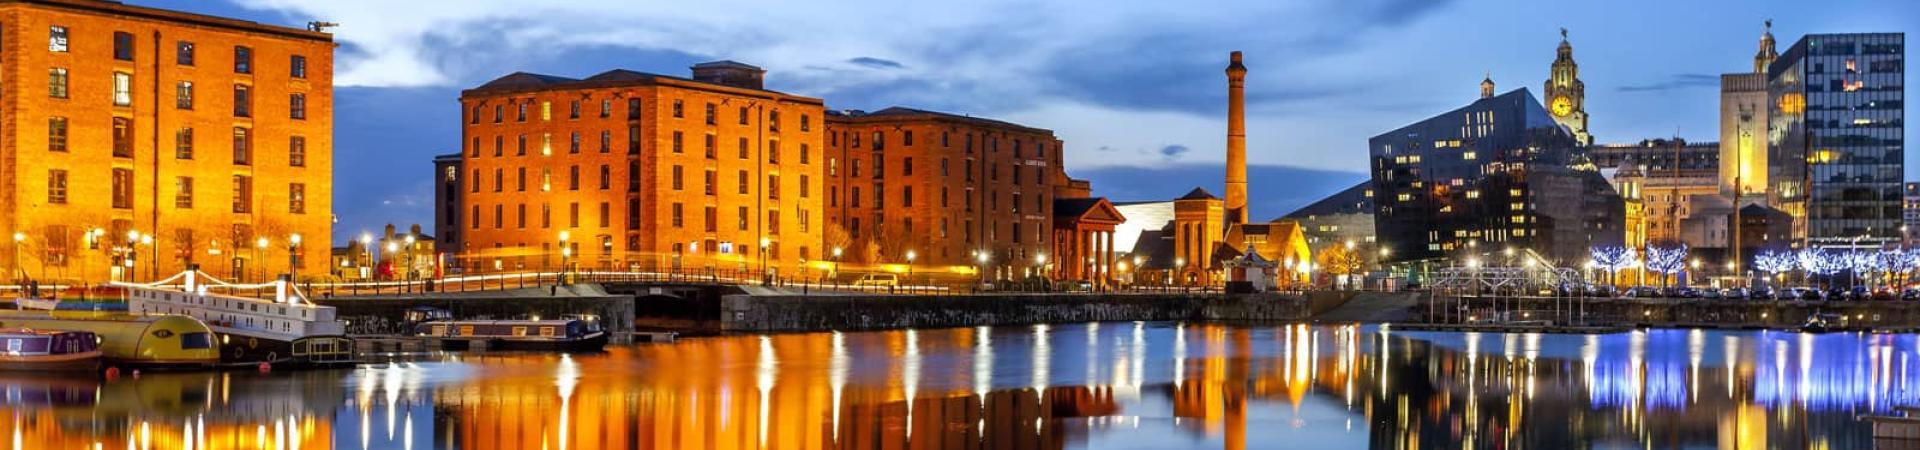 Liverpool docks lit up at night